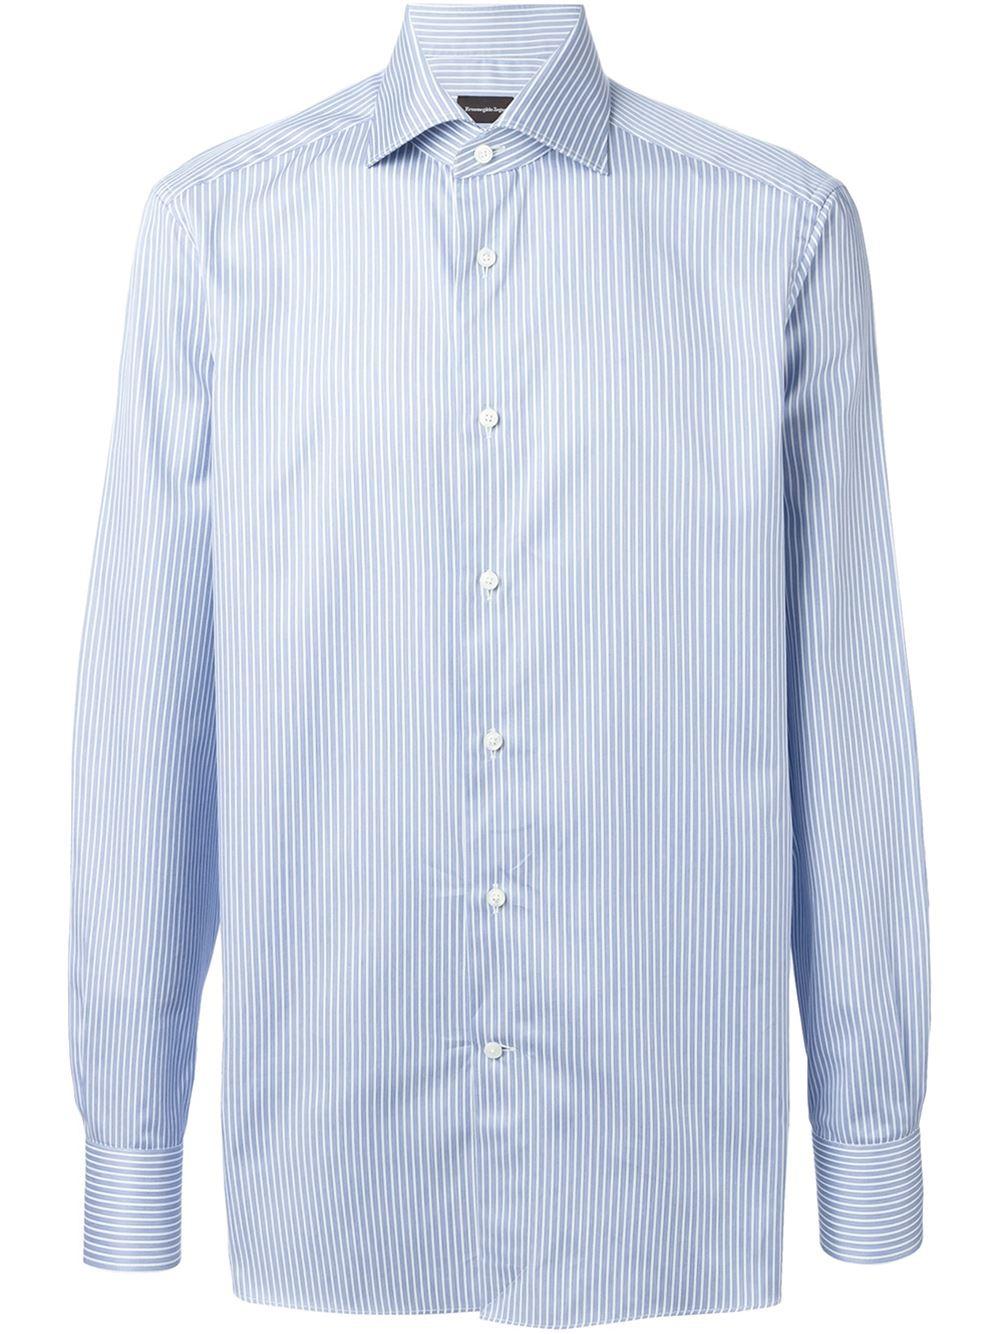 ermenegildo zegna 39 milano 39 striped shirt in blue for men lyst. Black Bedroom Furniture Sets. Home Design Ideas